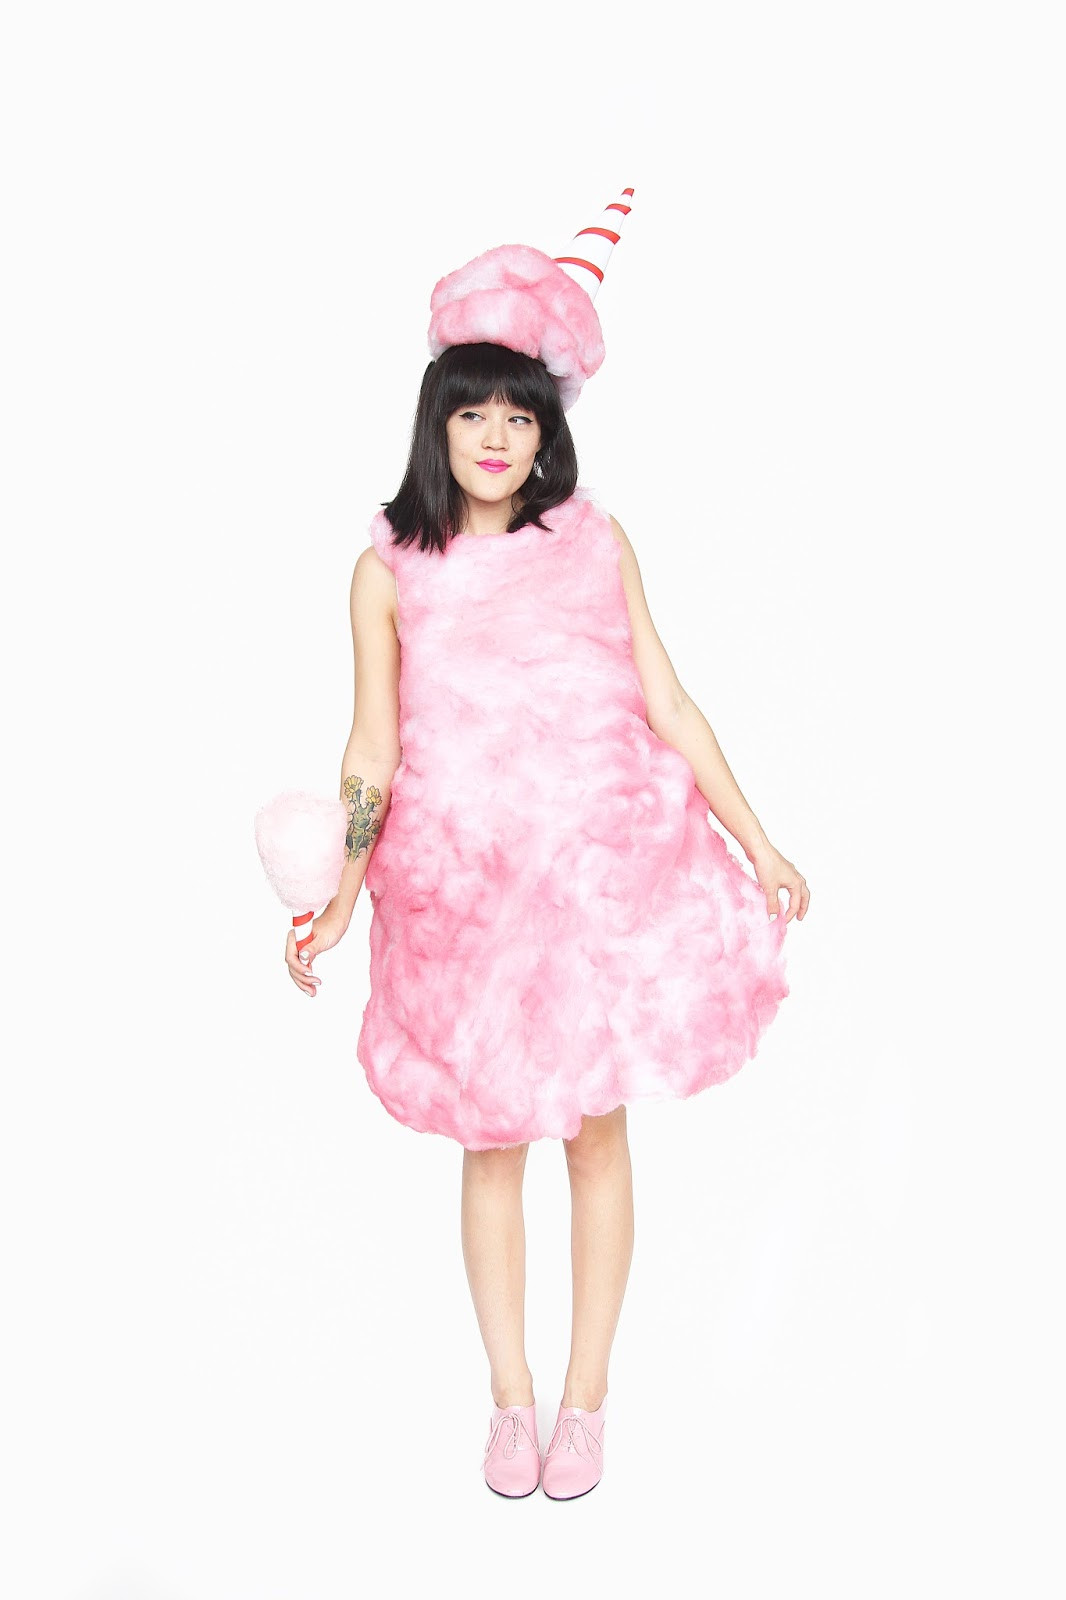 DIY Candy Costume  DIY Cotton Candy Halloween Costume